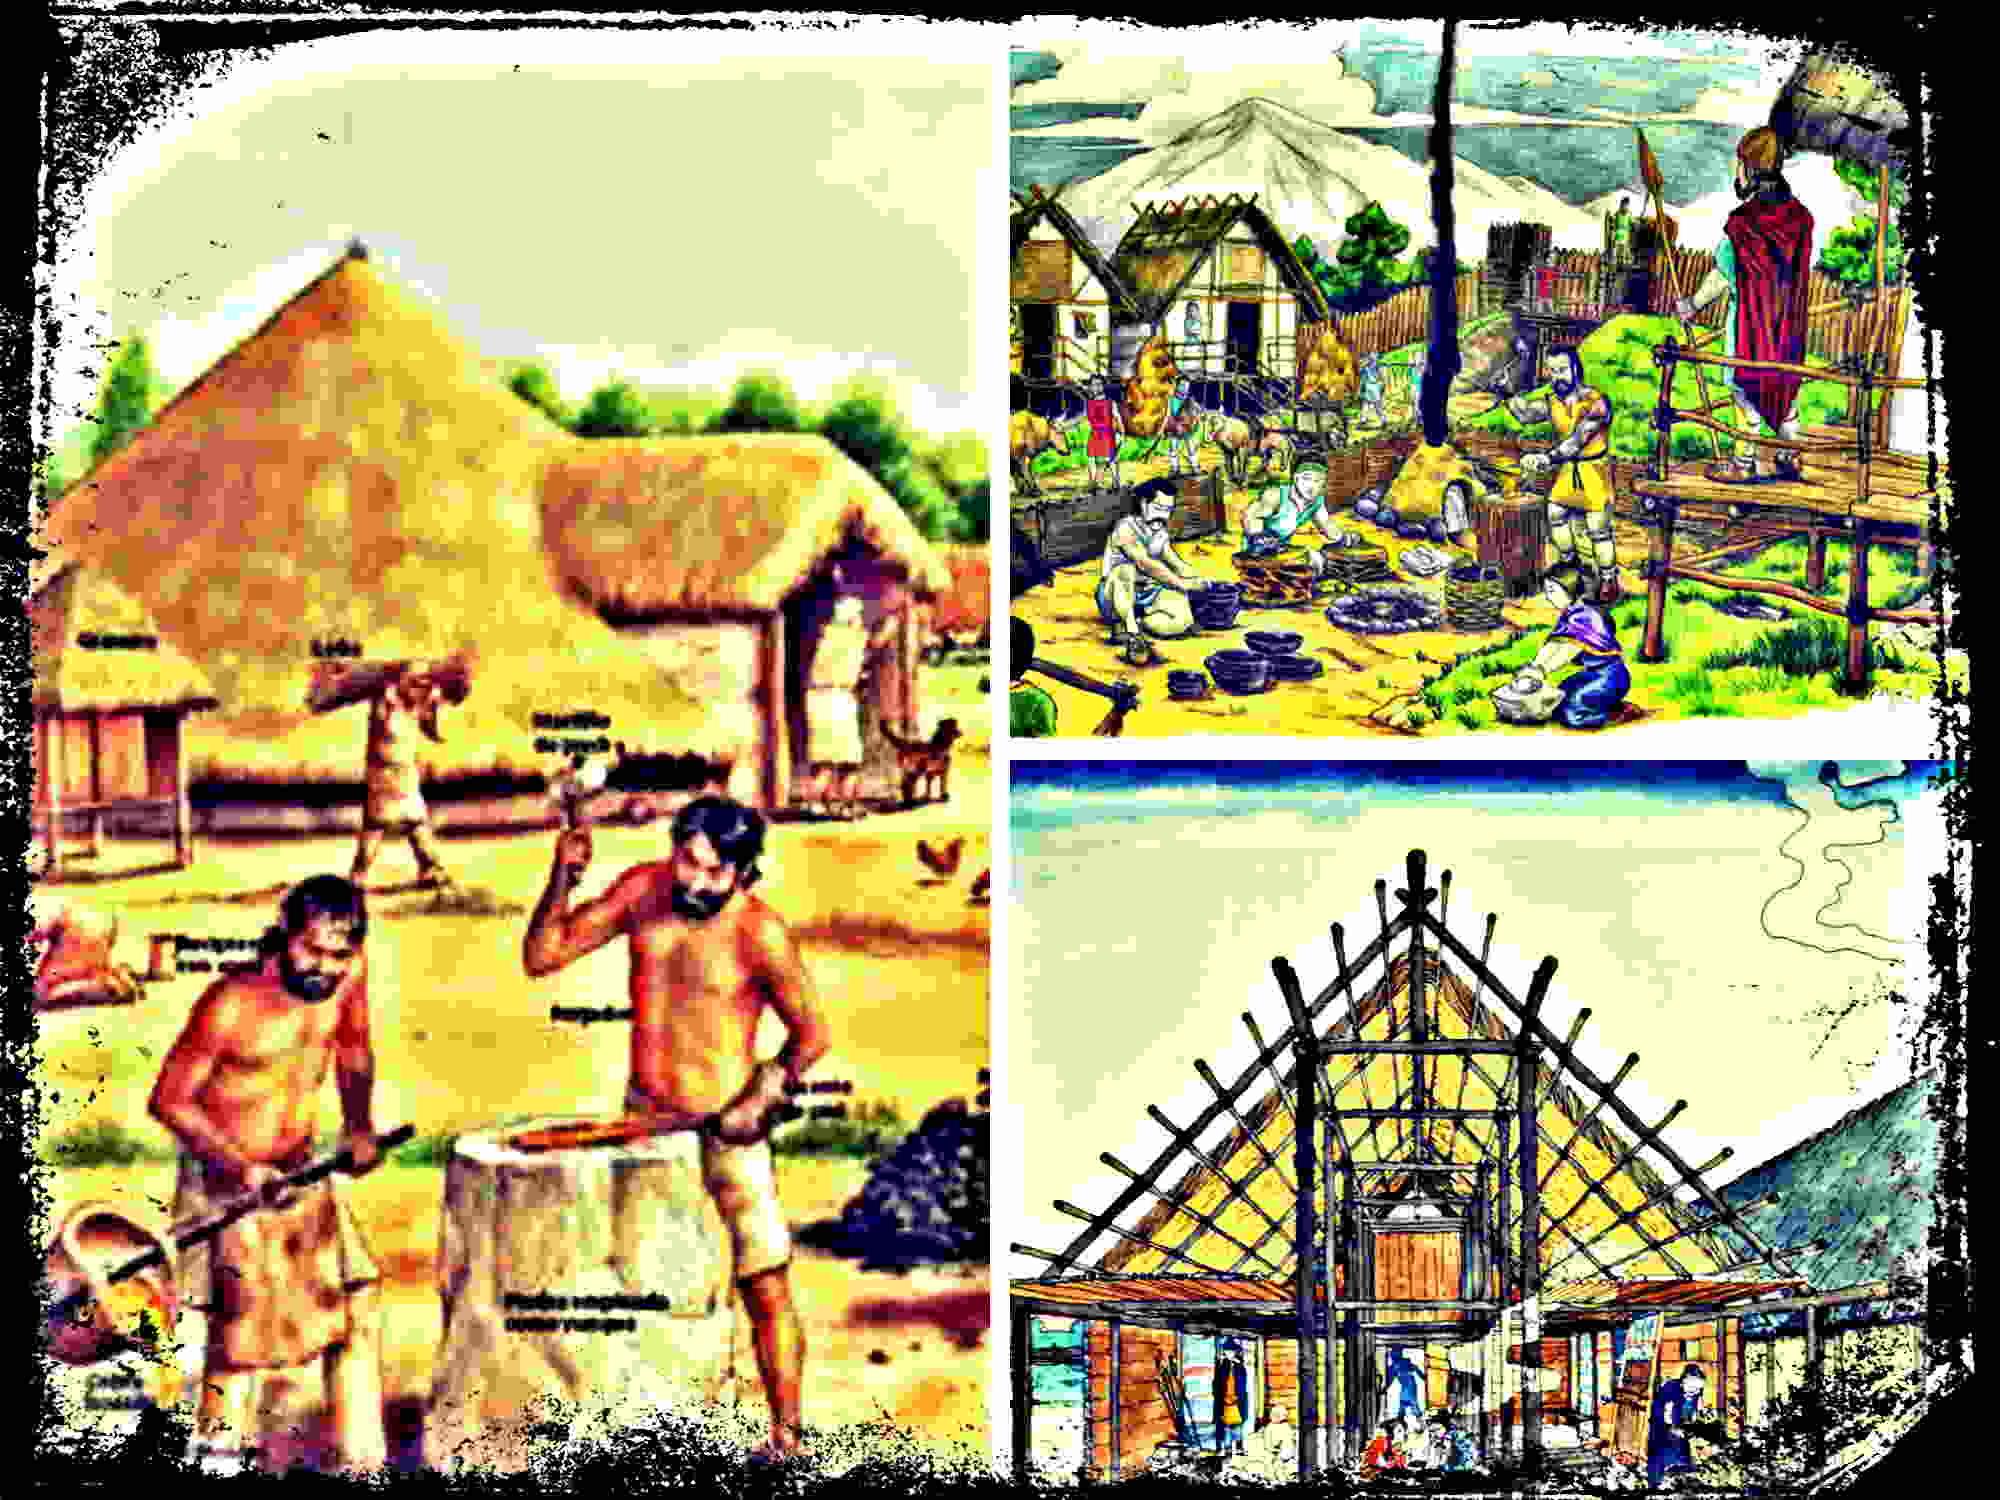 La cultura de los terramaras